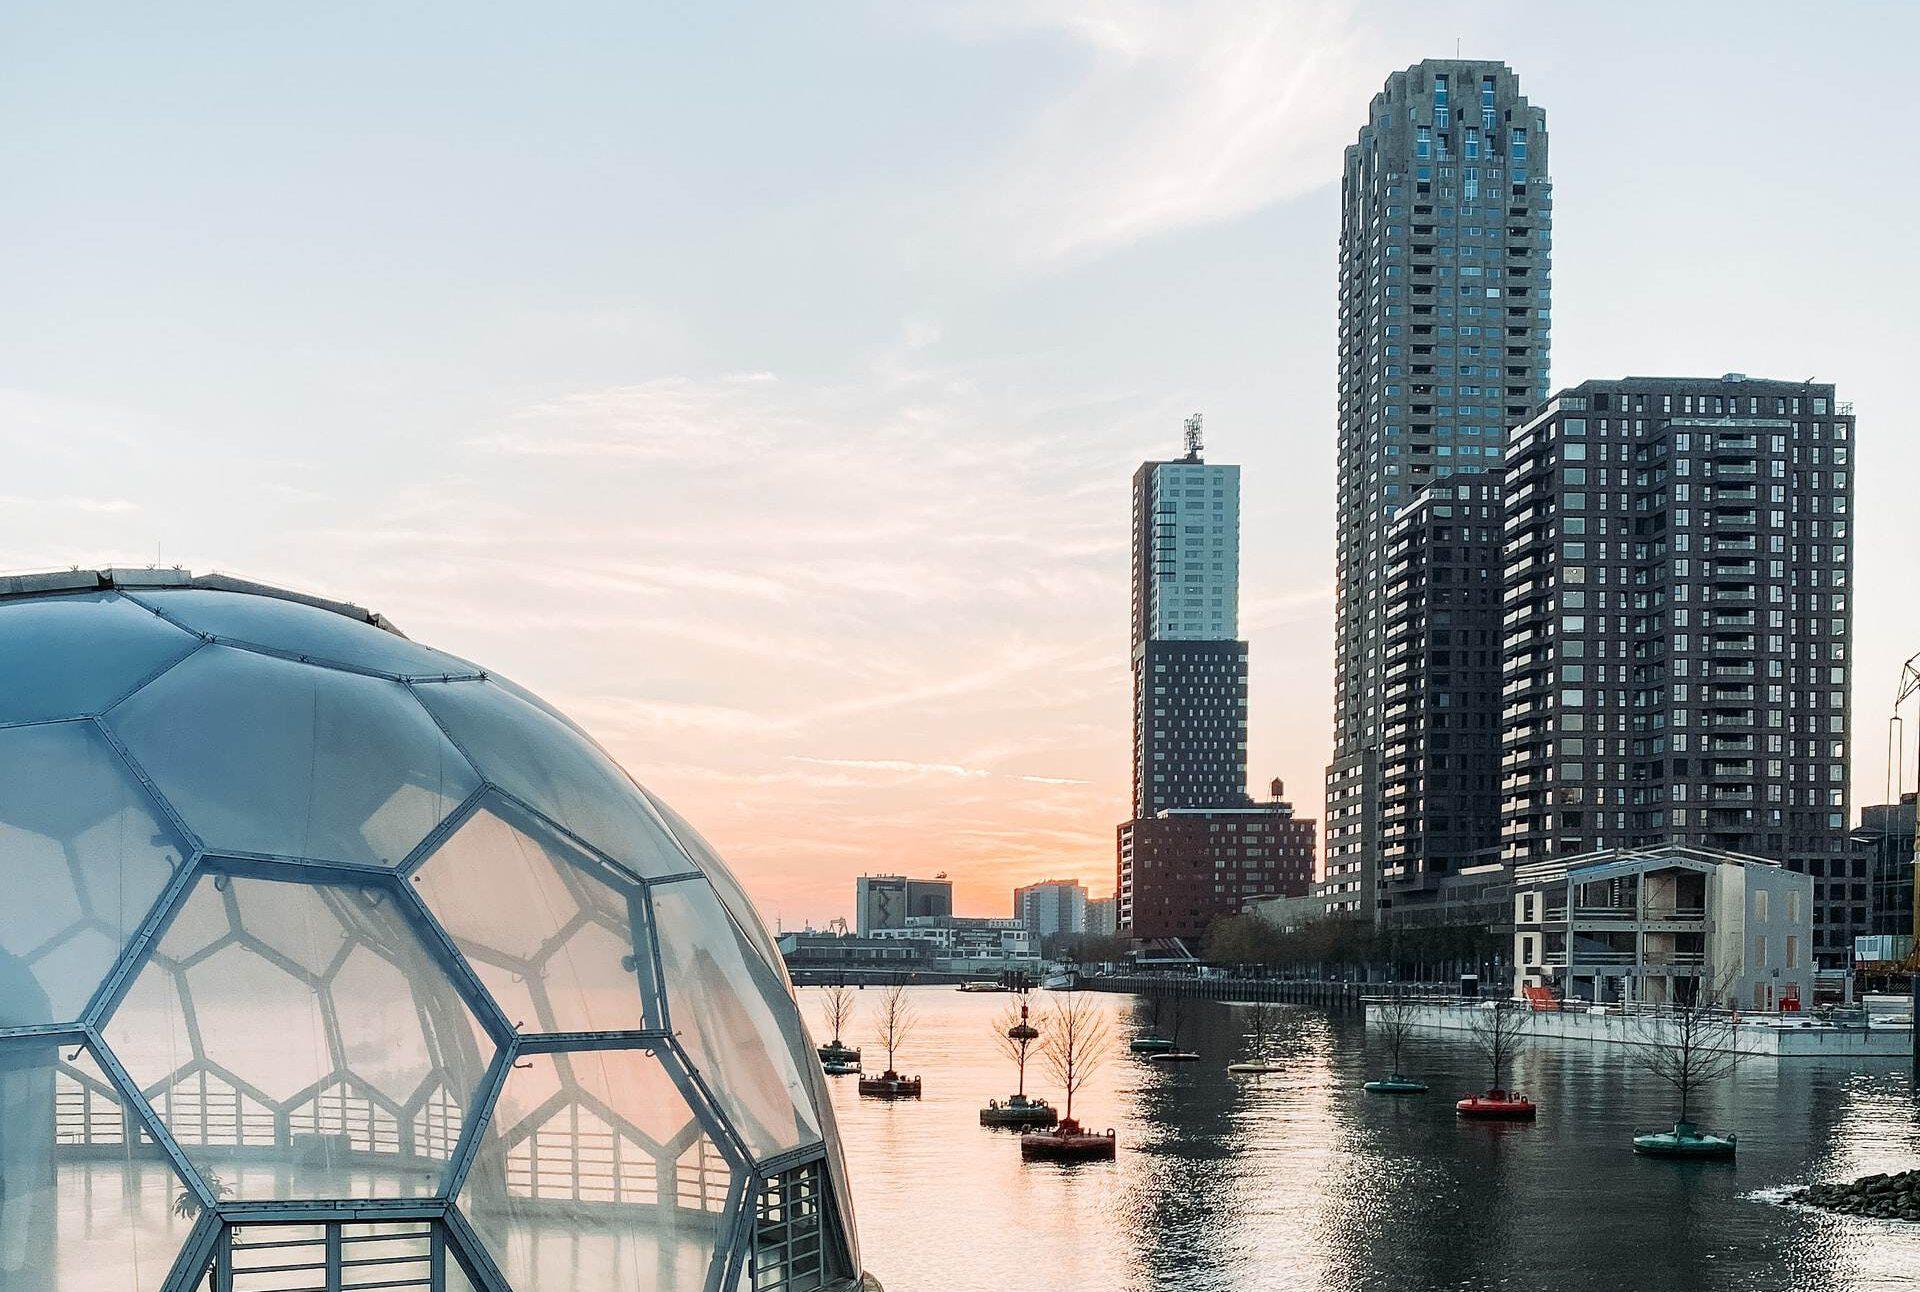 Photo-of-Erasmus-Bridge-Rotterdam-skyscrapers-in-background